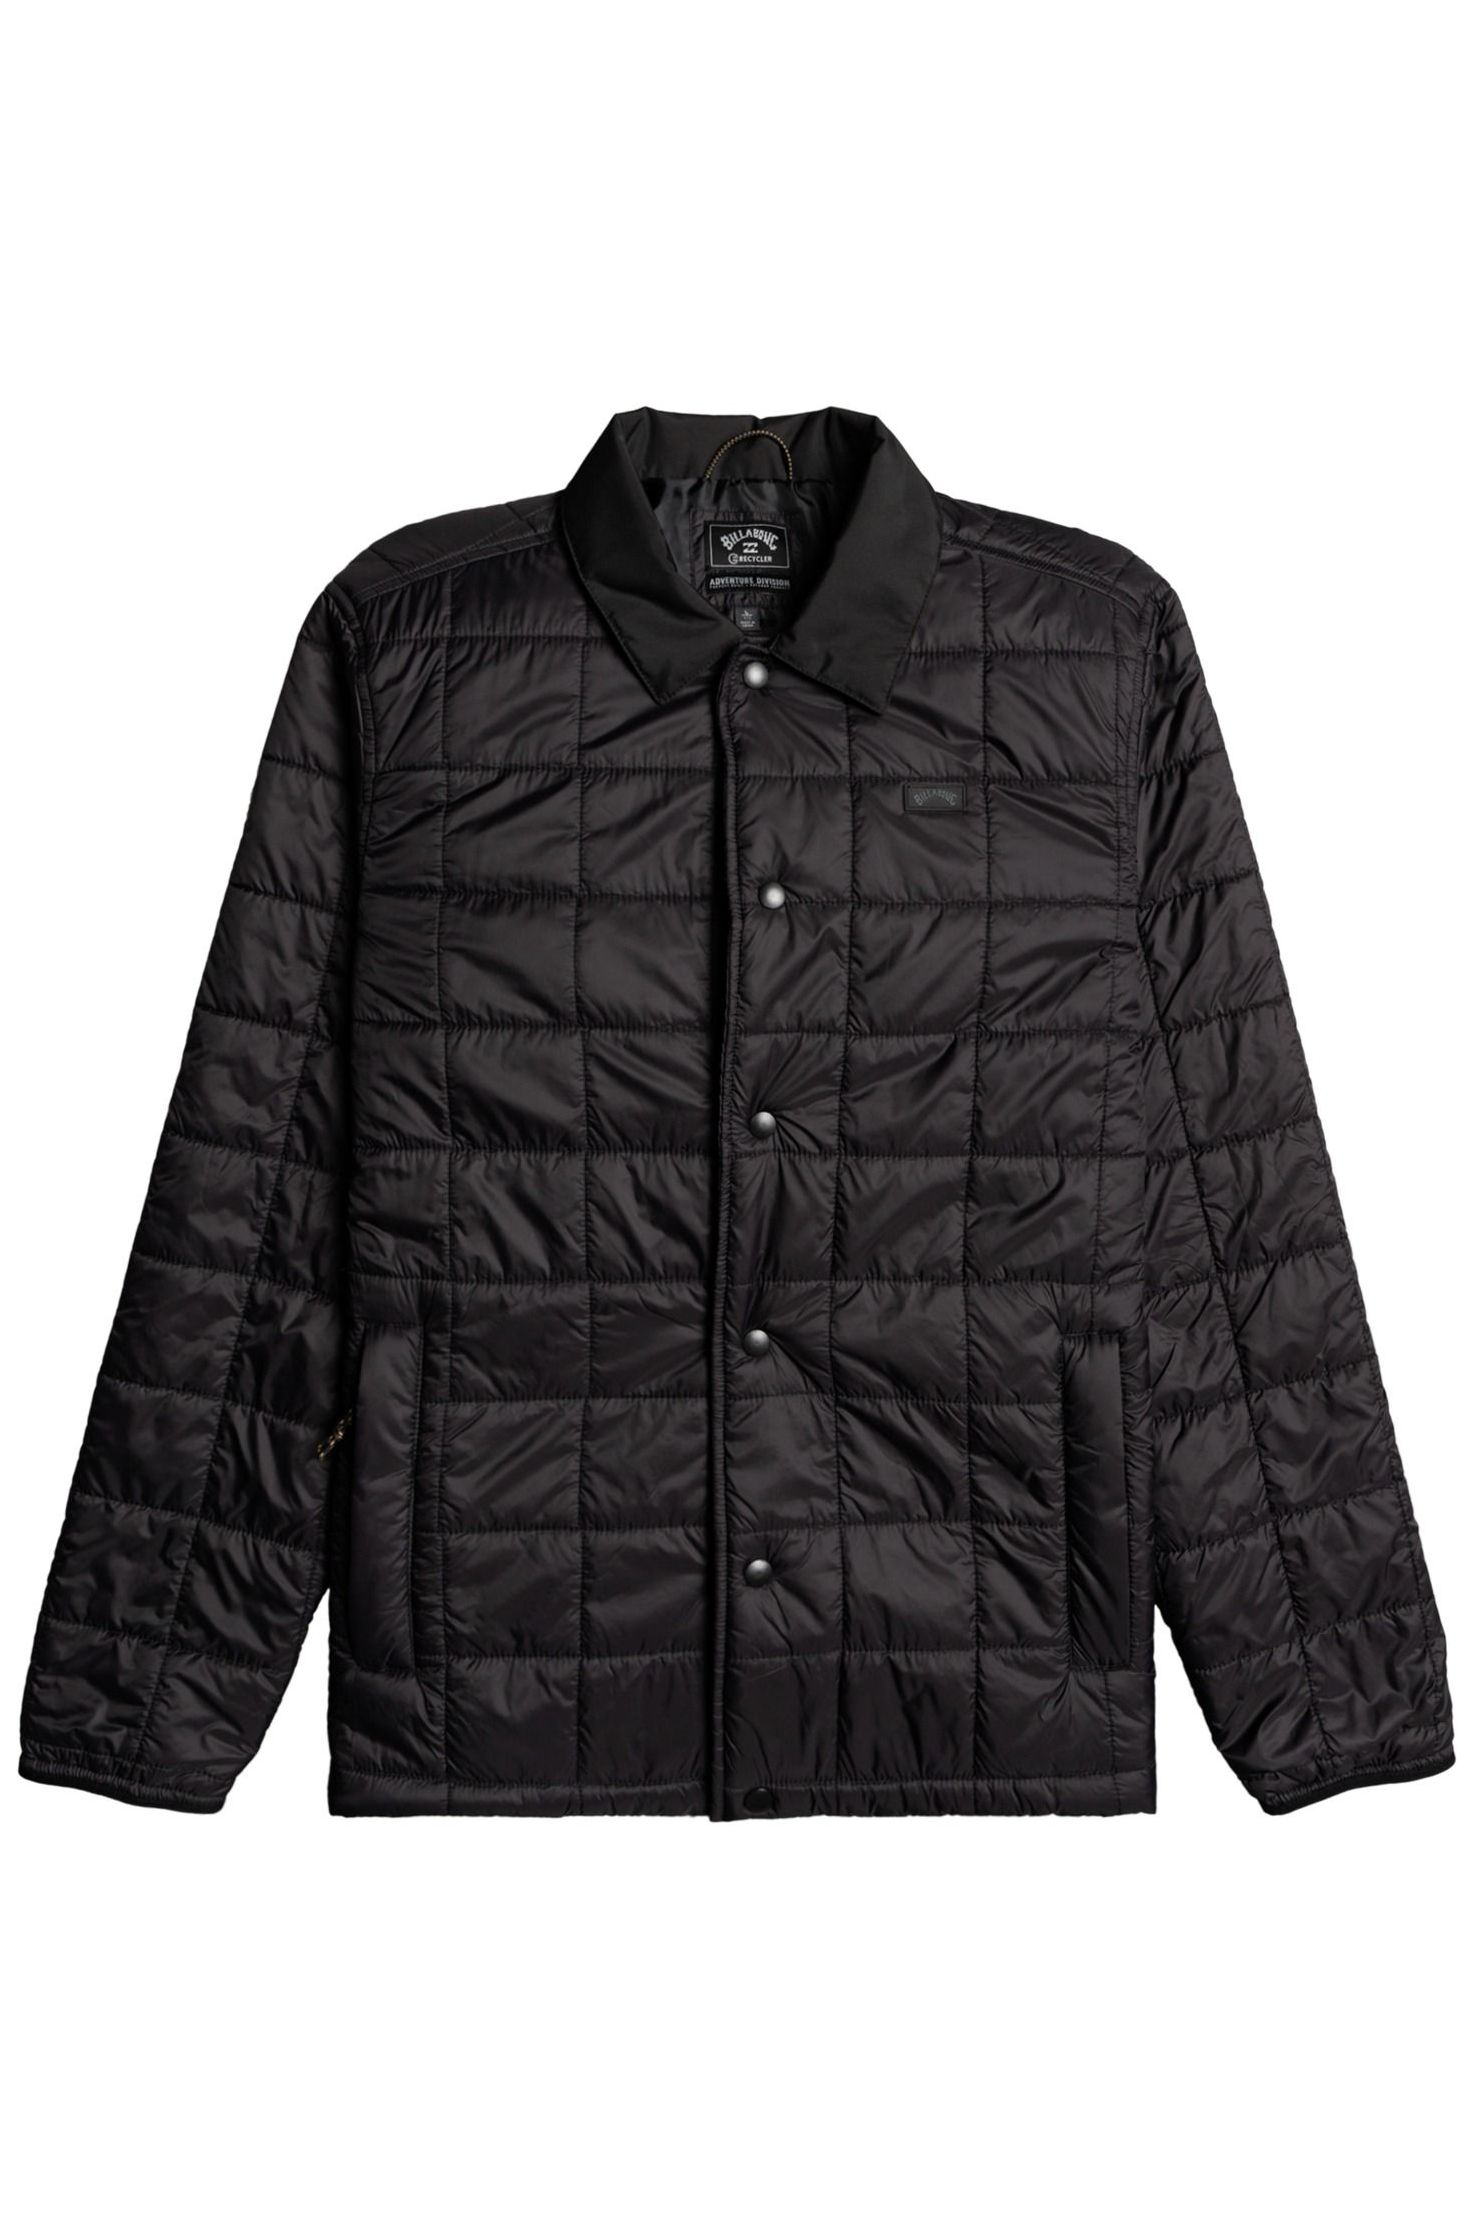 Billabong Jacket JOURNEY COACH JACKET ADVENTURE DIVISION Black